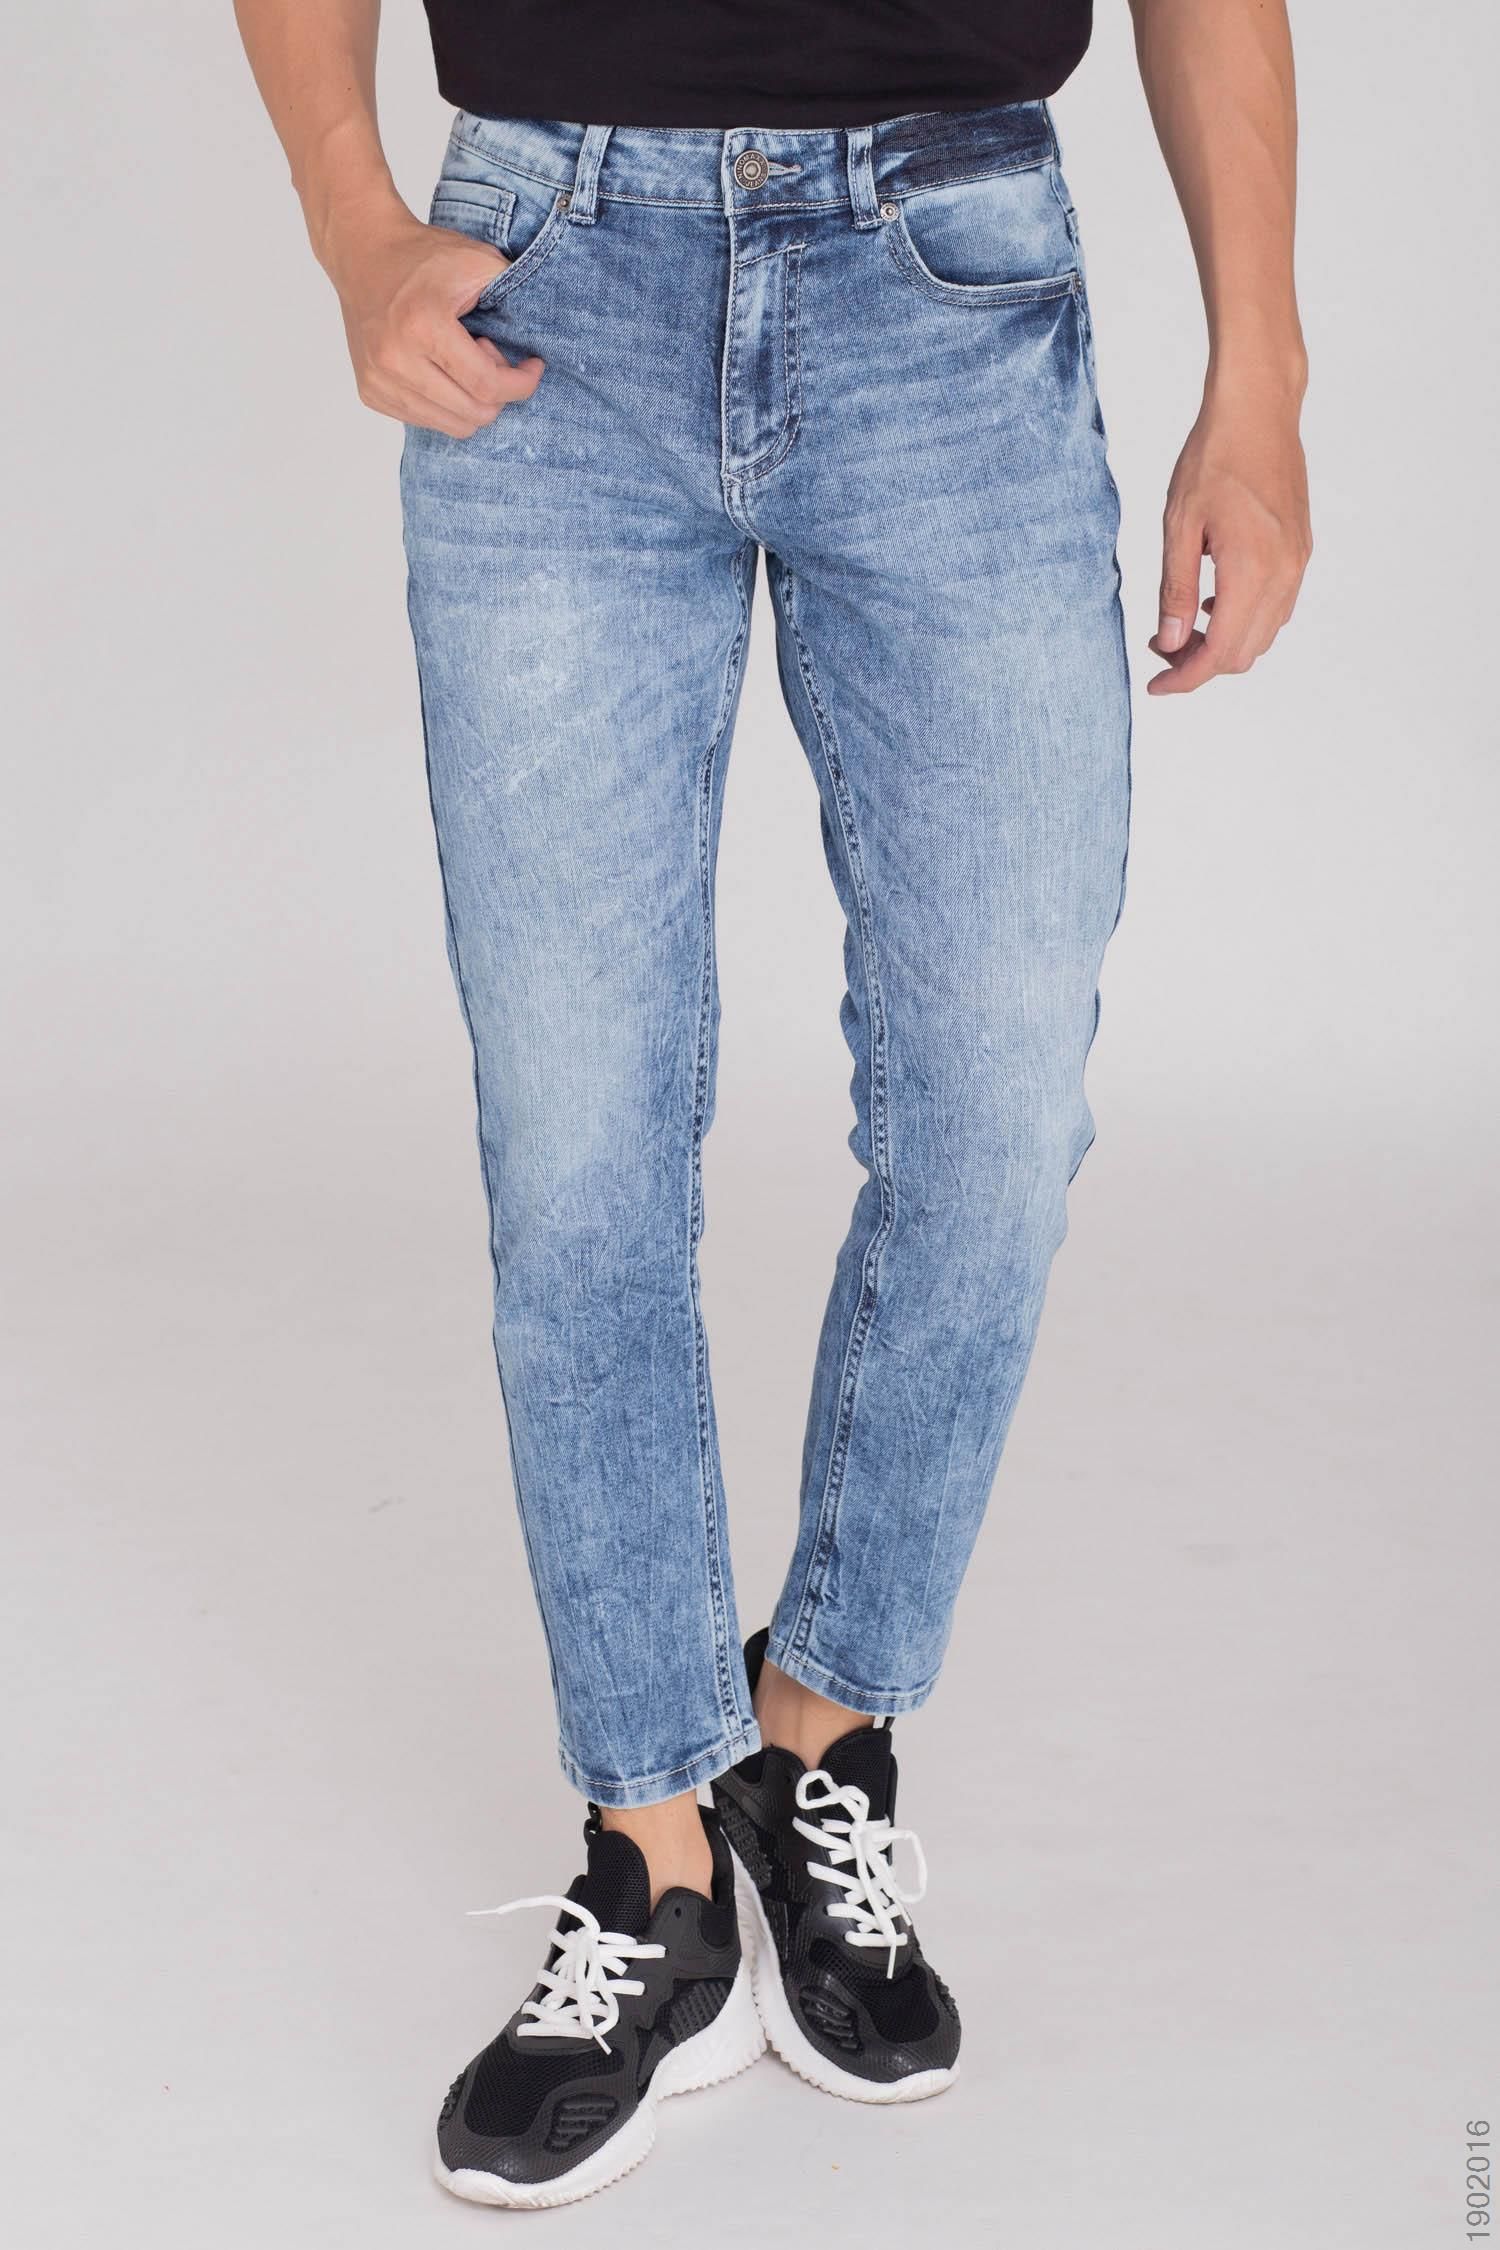 quần jean nam - 1902016